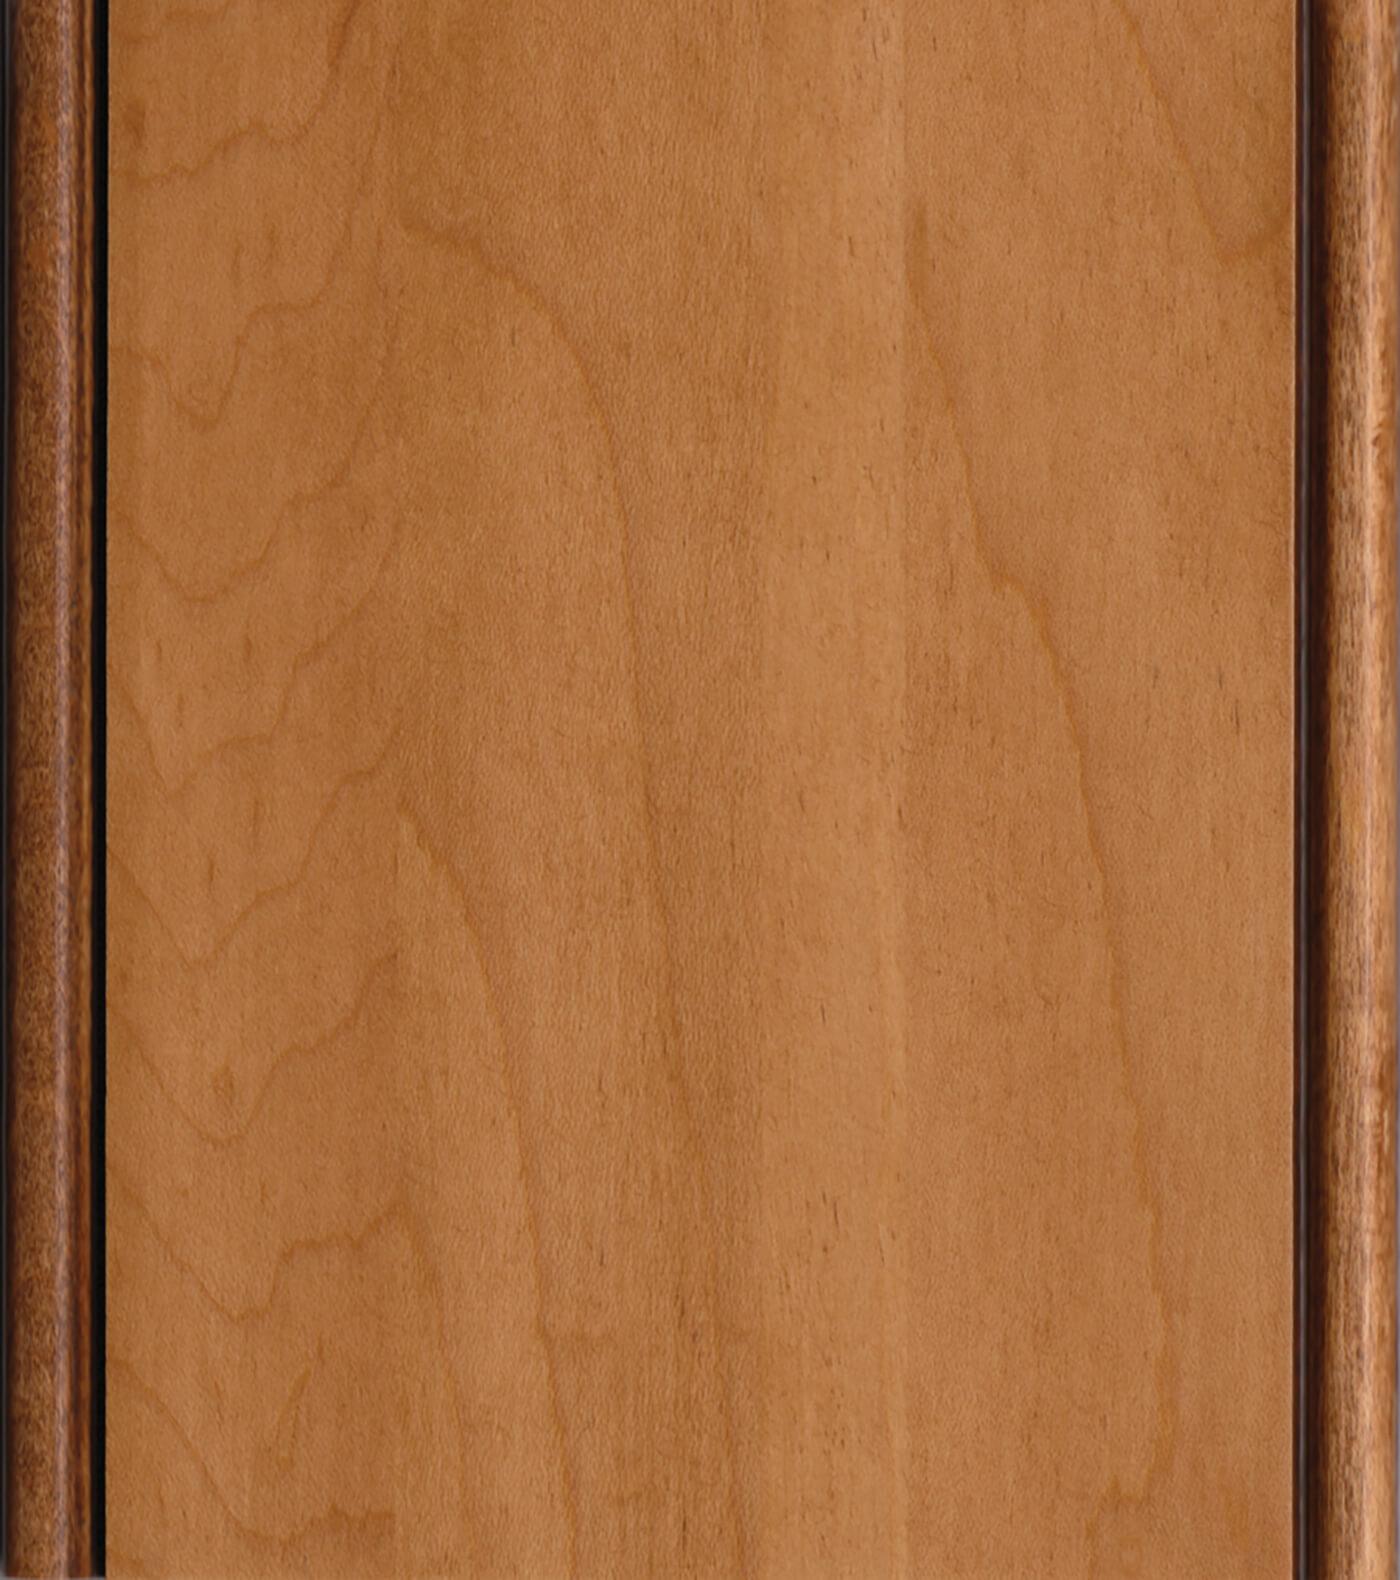 Butternut / Coffee Glaze Stain/Glaze on Maple